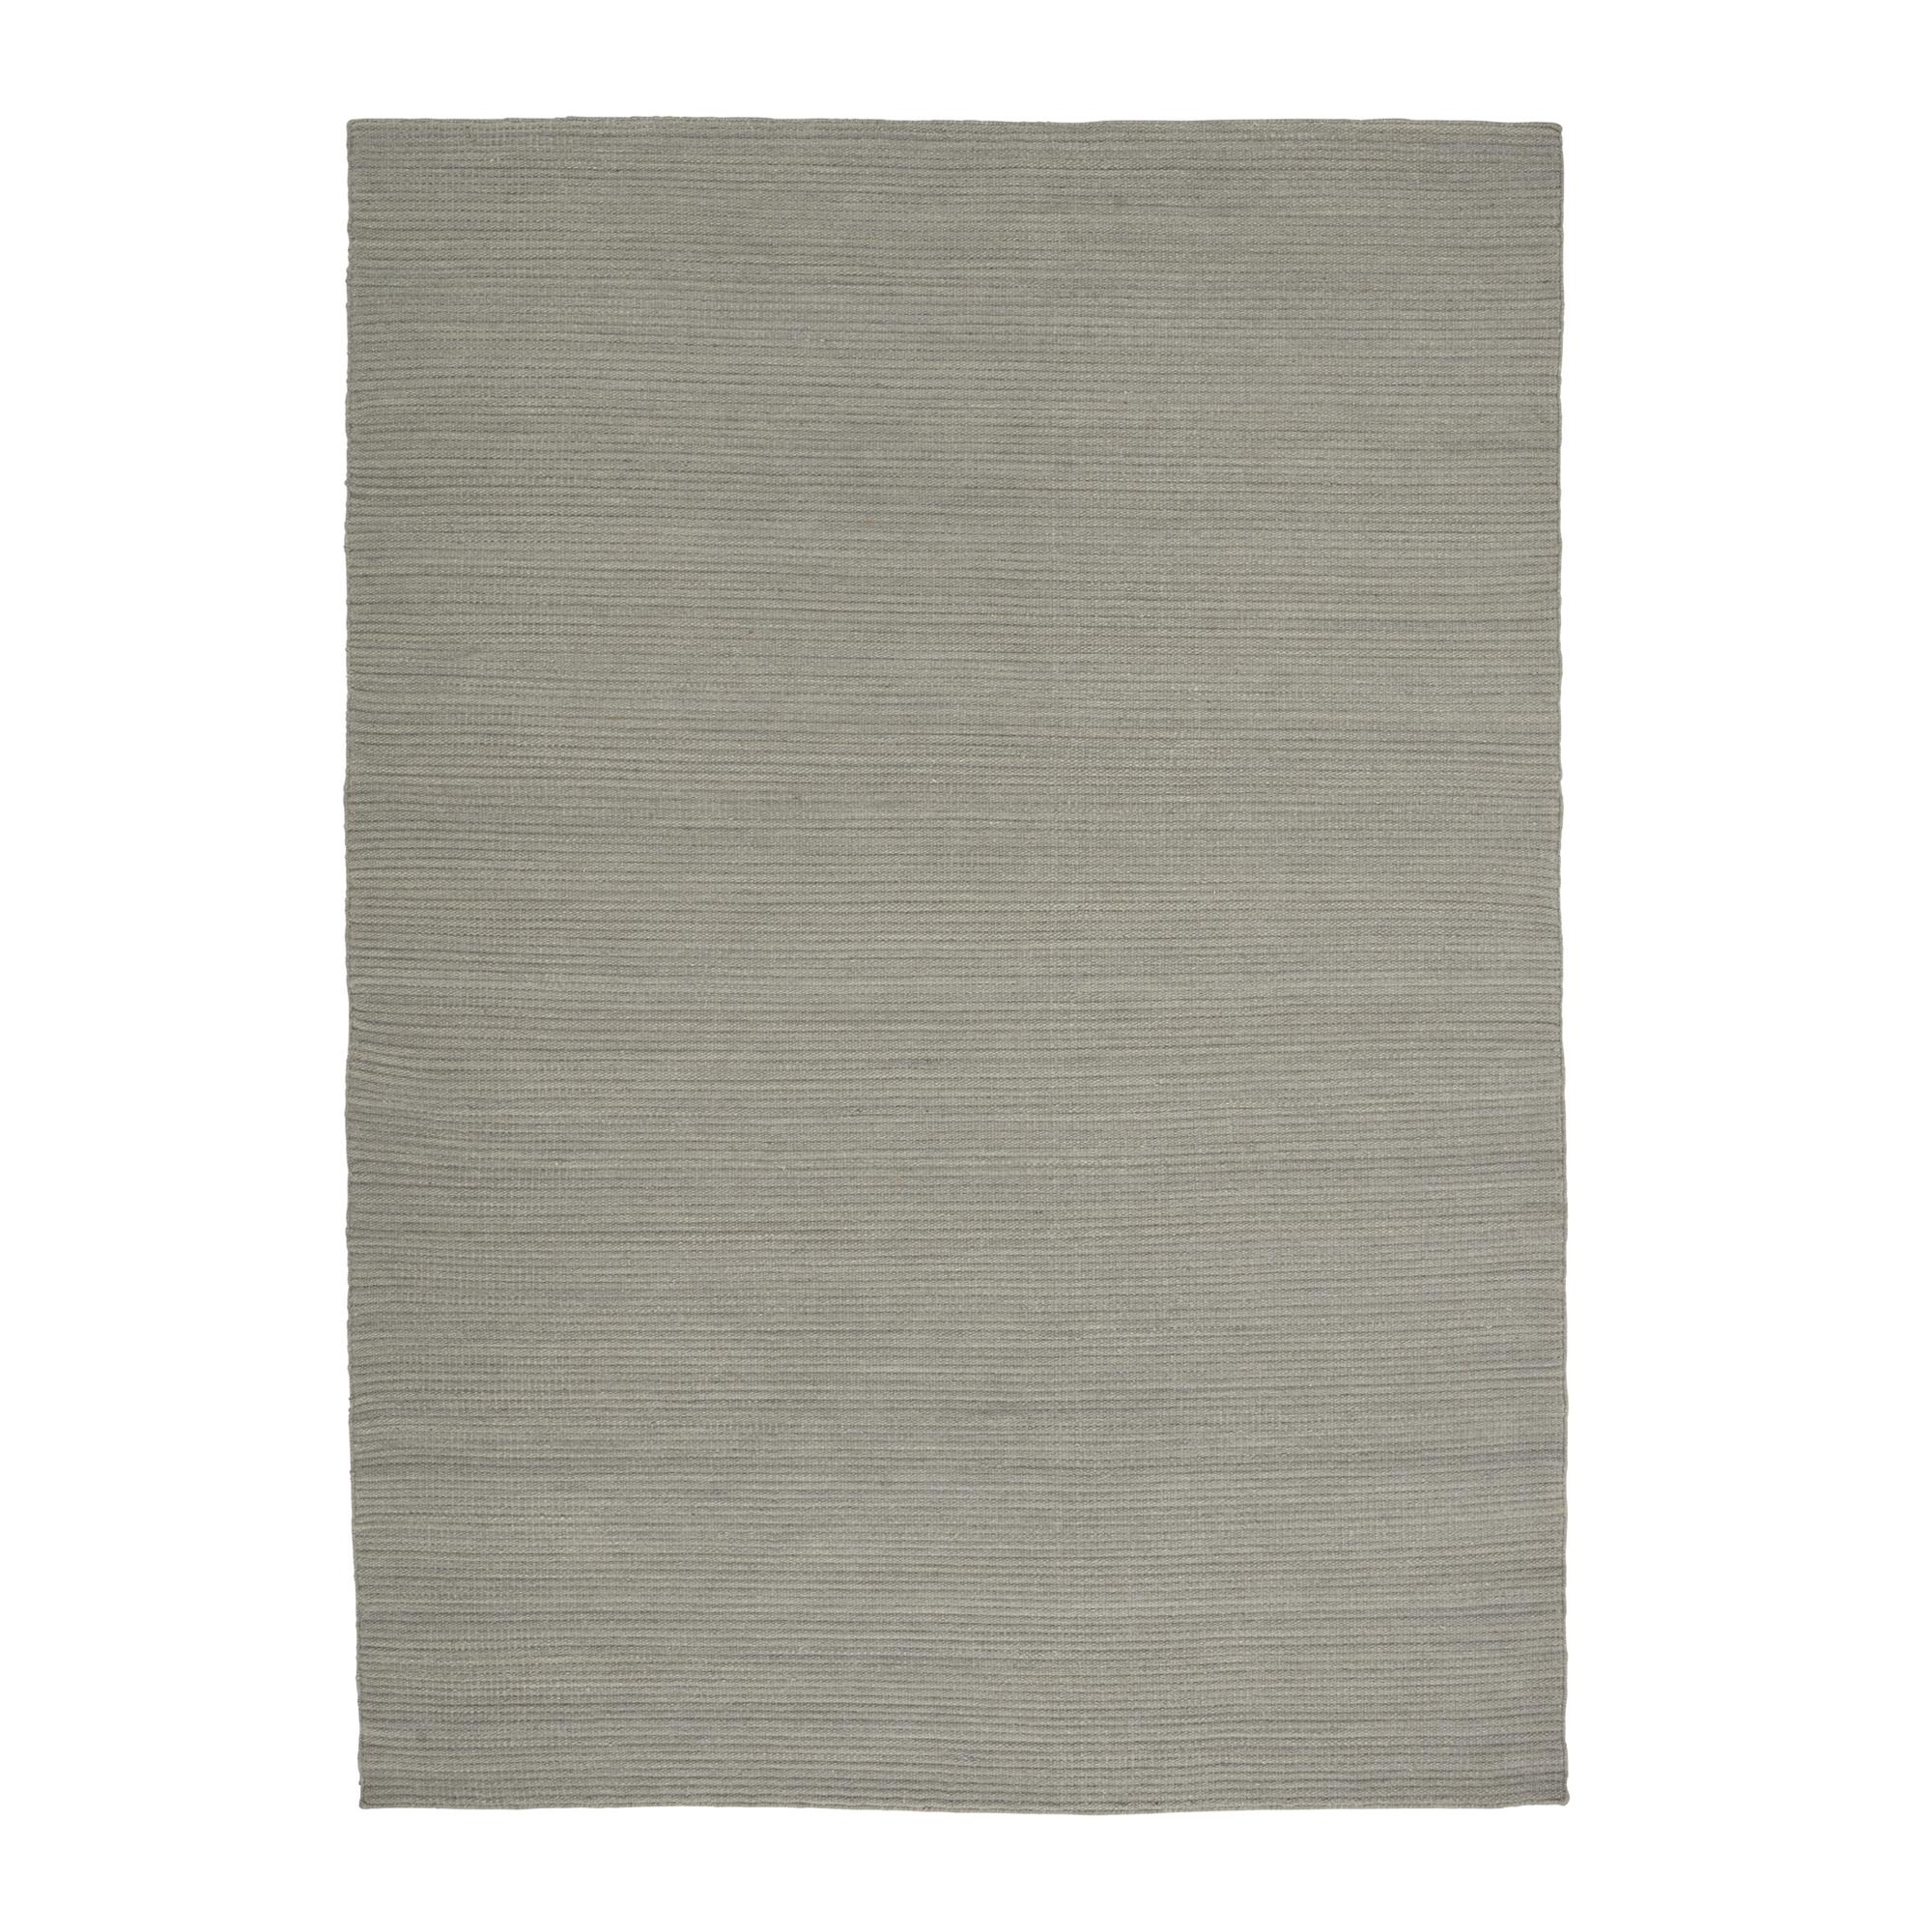 Ullmatta LIVELLO 160 x 230 cm grå, Linie Design